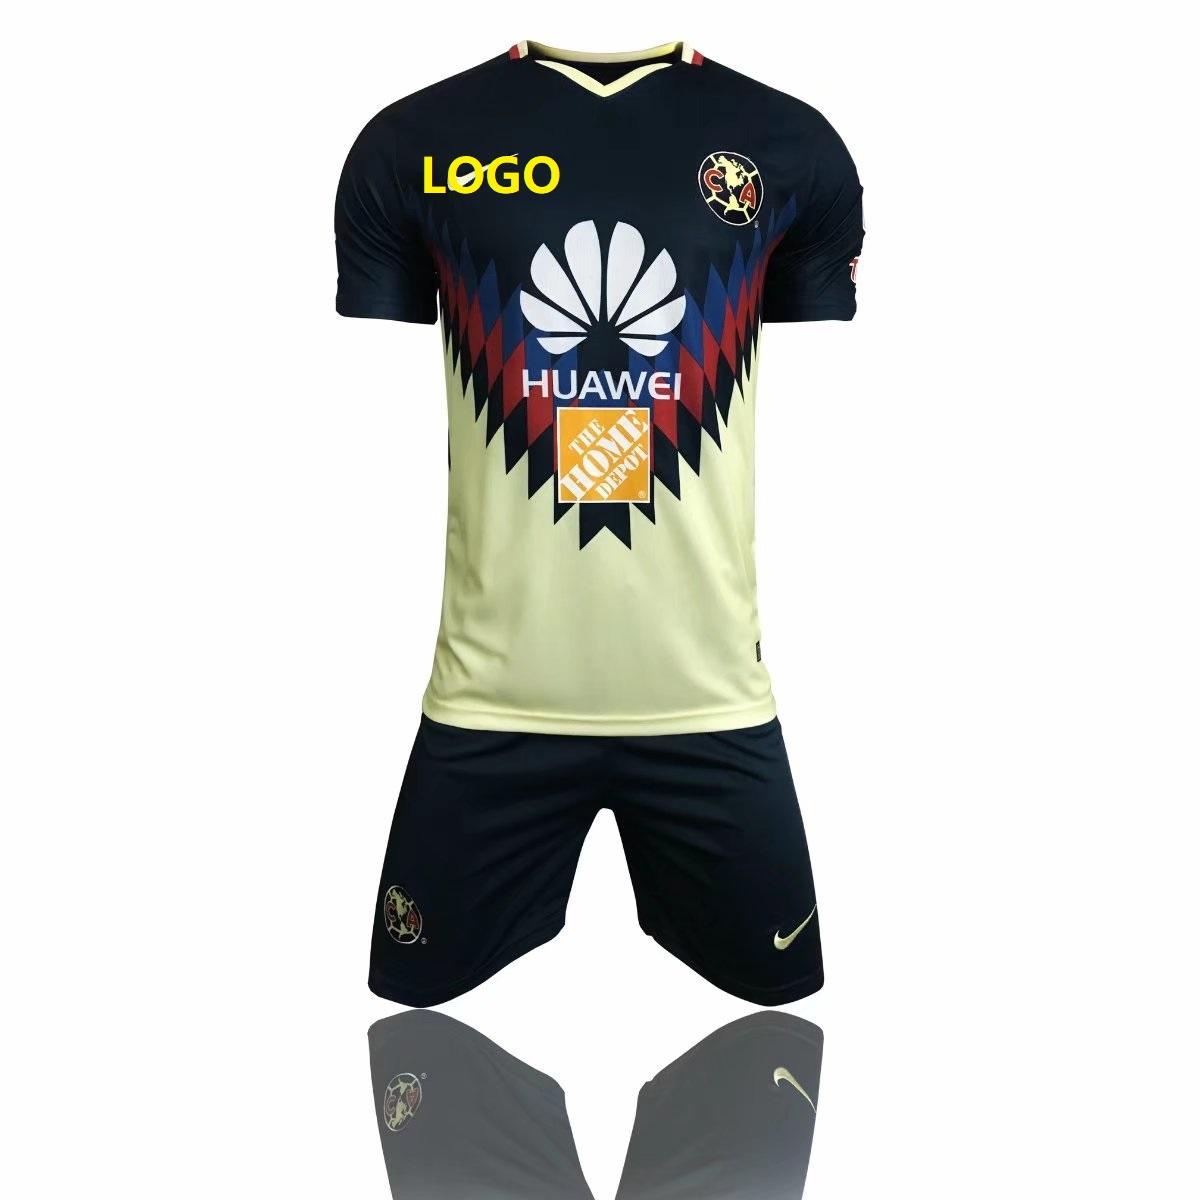 0ec9d6a795f America Aguilas 2017 camiseta de futbol Mexican League soccer jerseys set  thai quality Green 17 18 Mexico american club football shirts Item NO:  439217